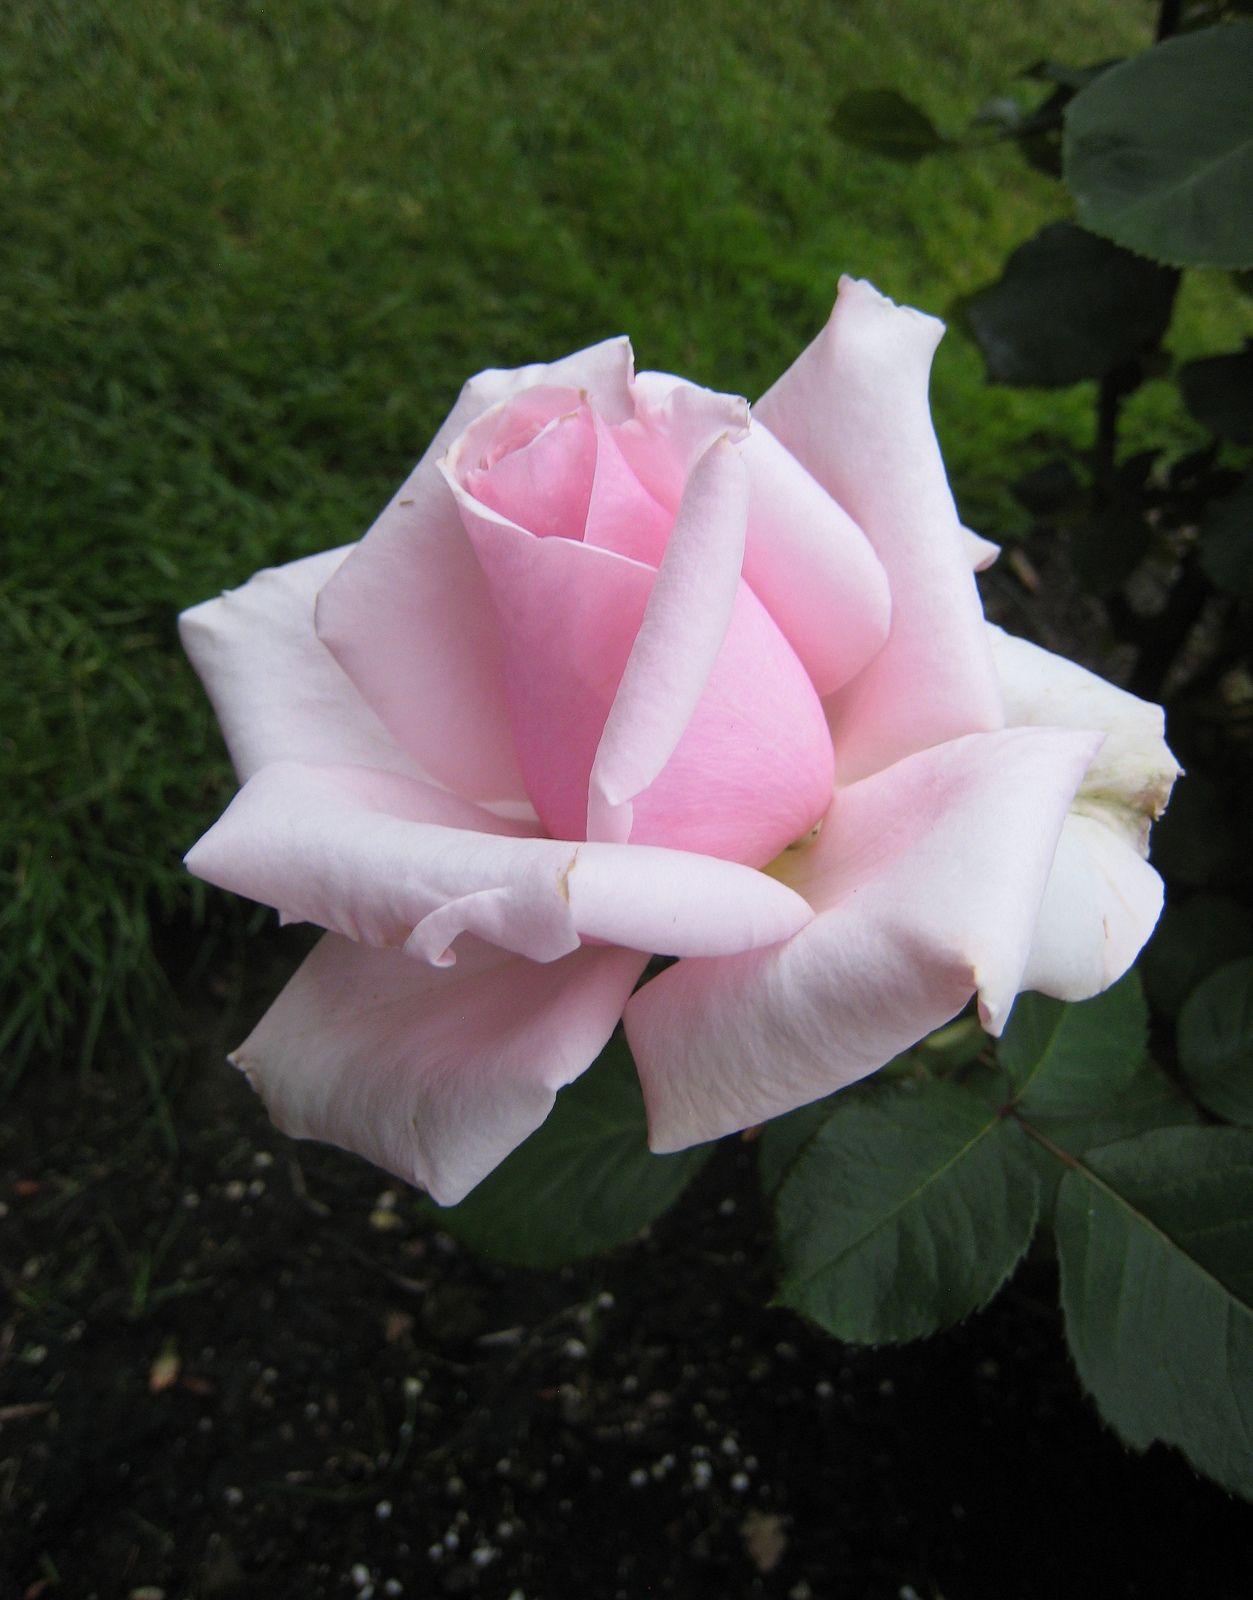 'Savoy Hotel' hybrid tea rose